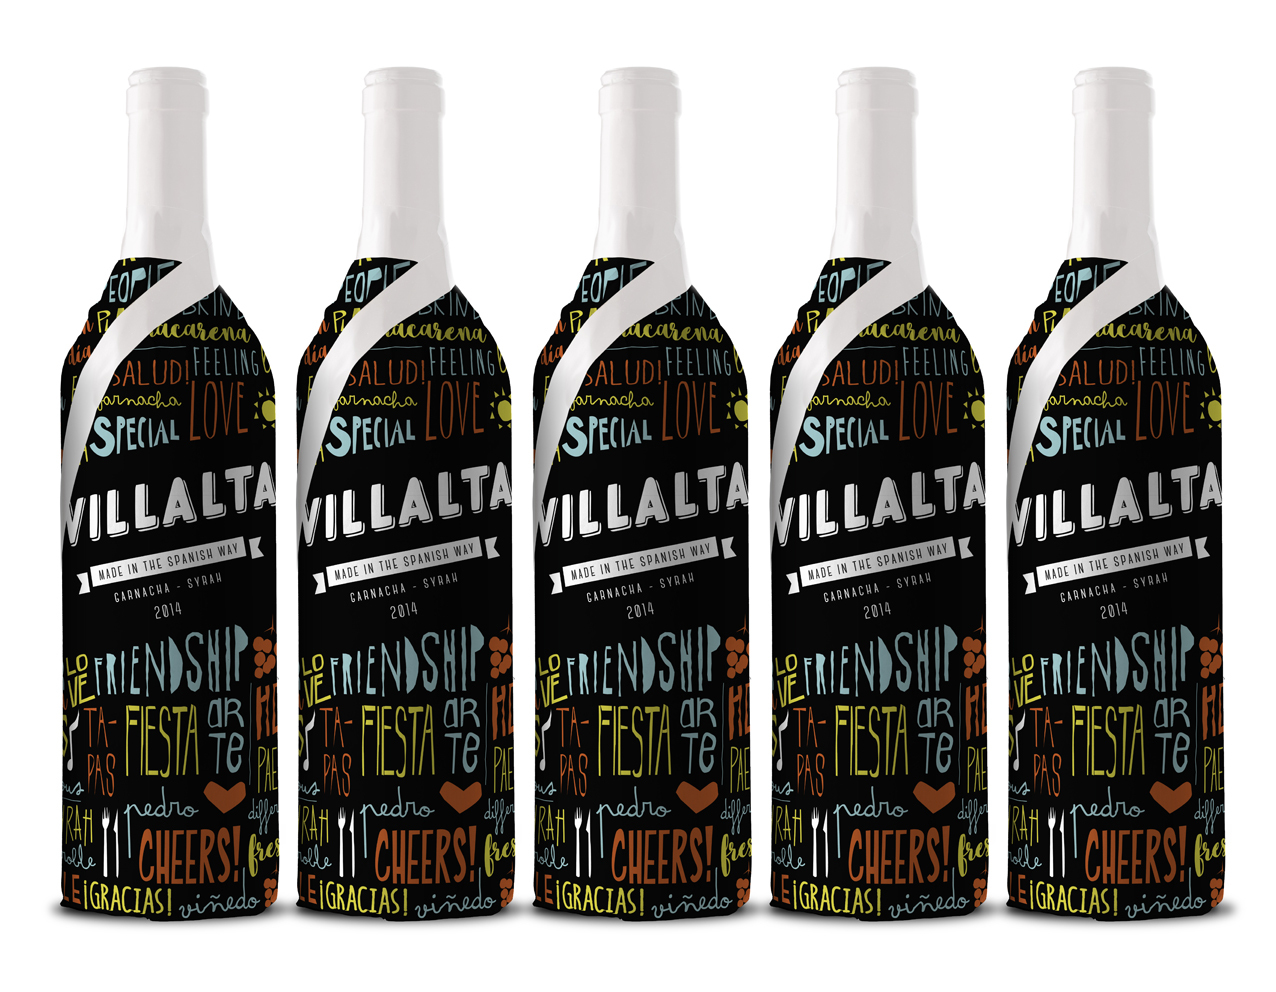 packaging-diseno-etiqueta-vino-villalta